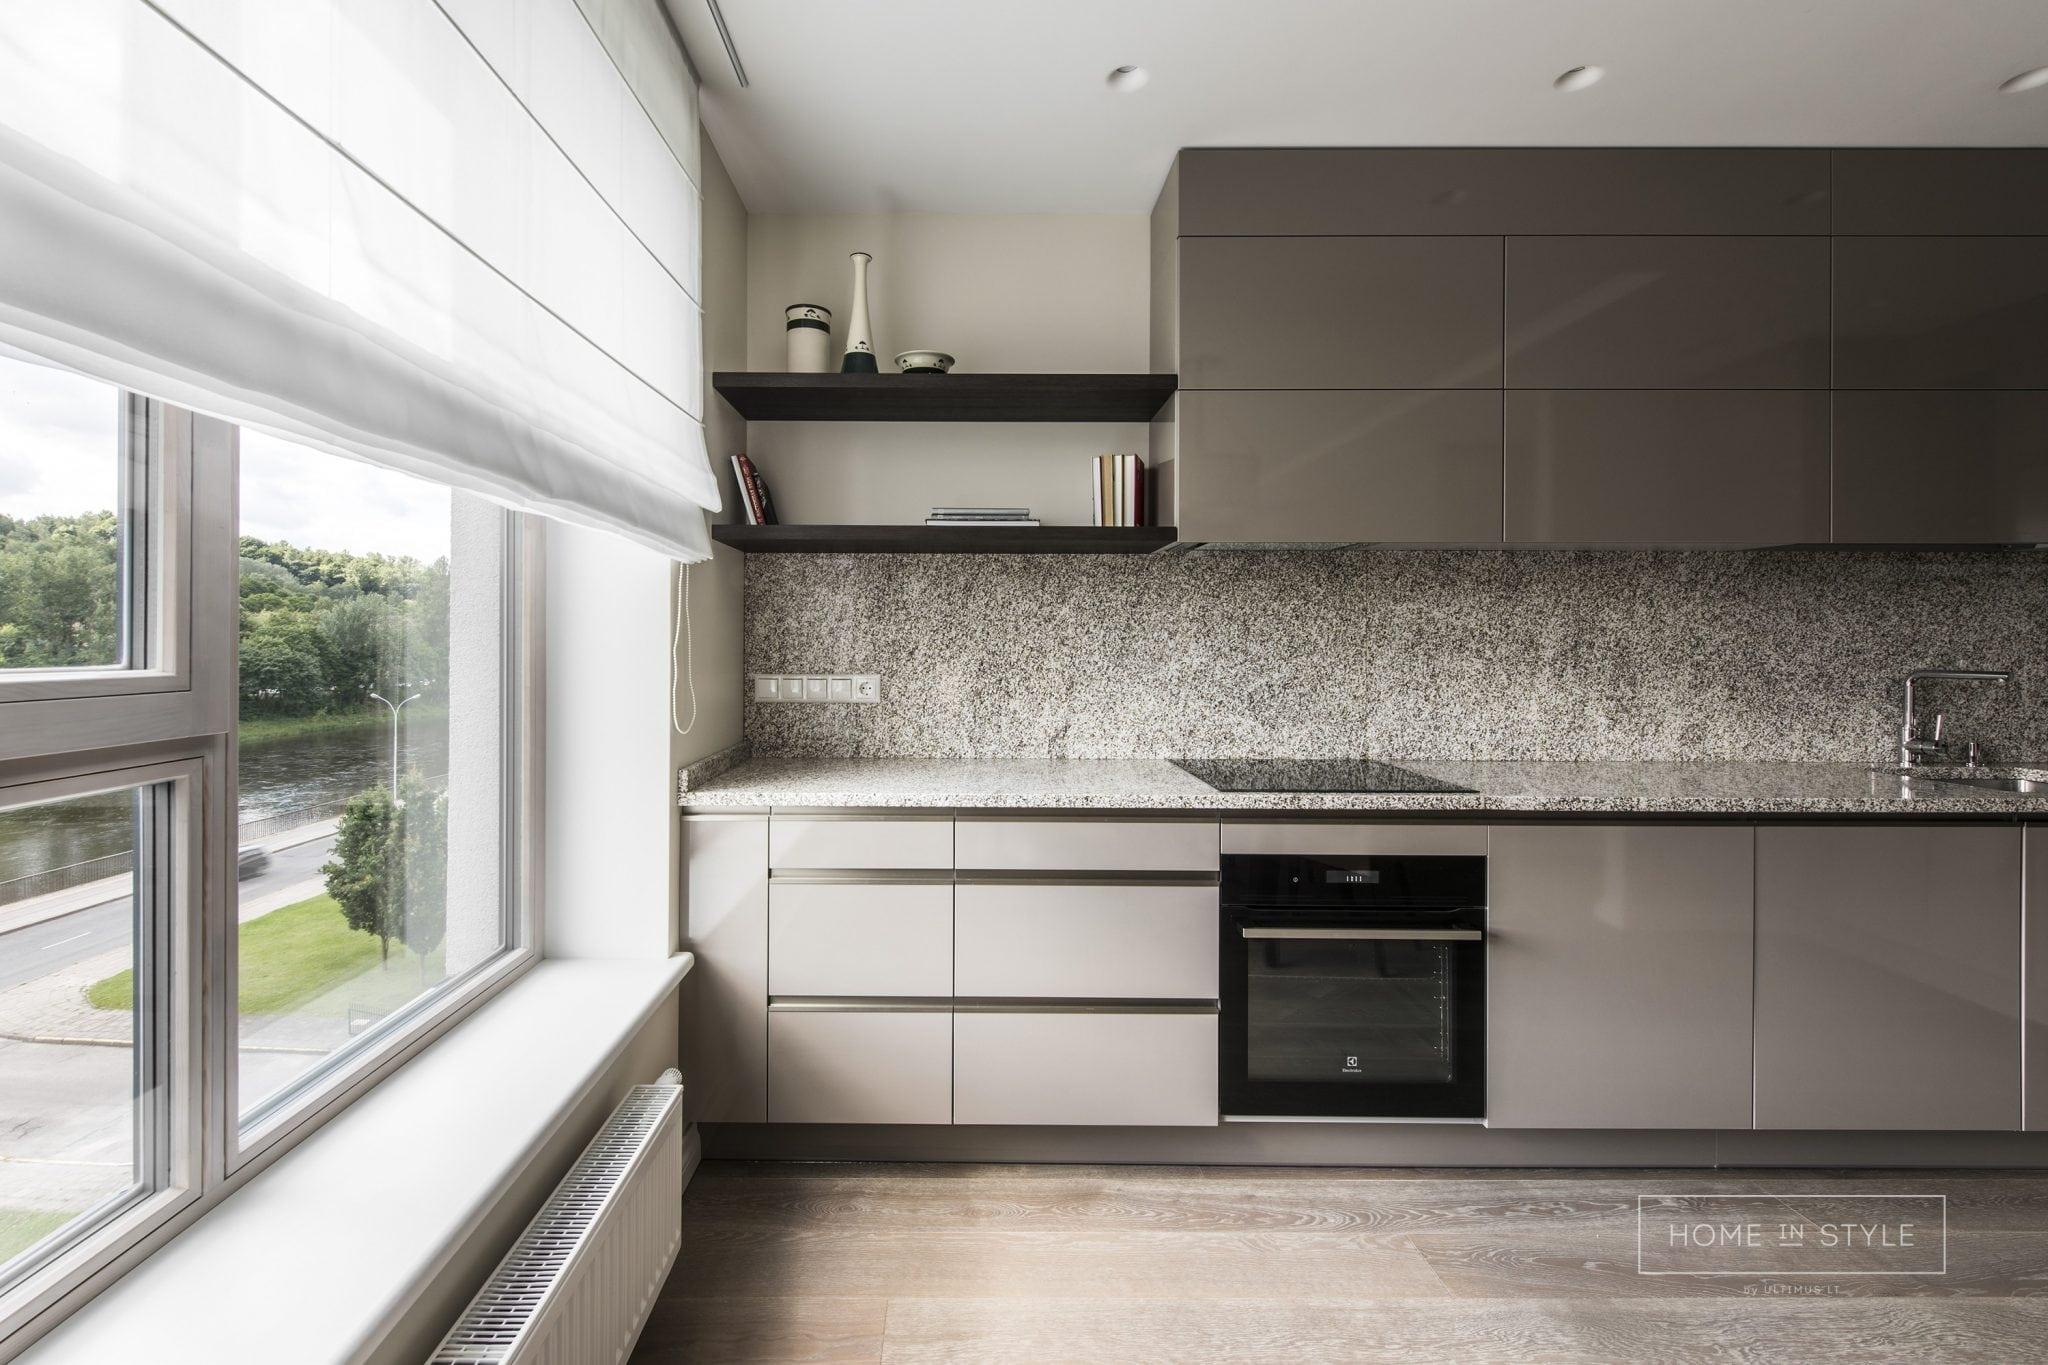 Virtuves baldu gamyba pagal individualius uzsakymus.